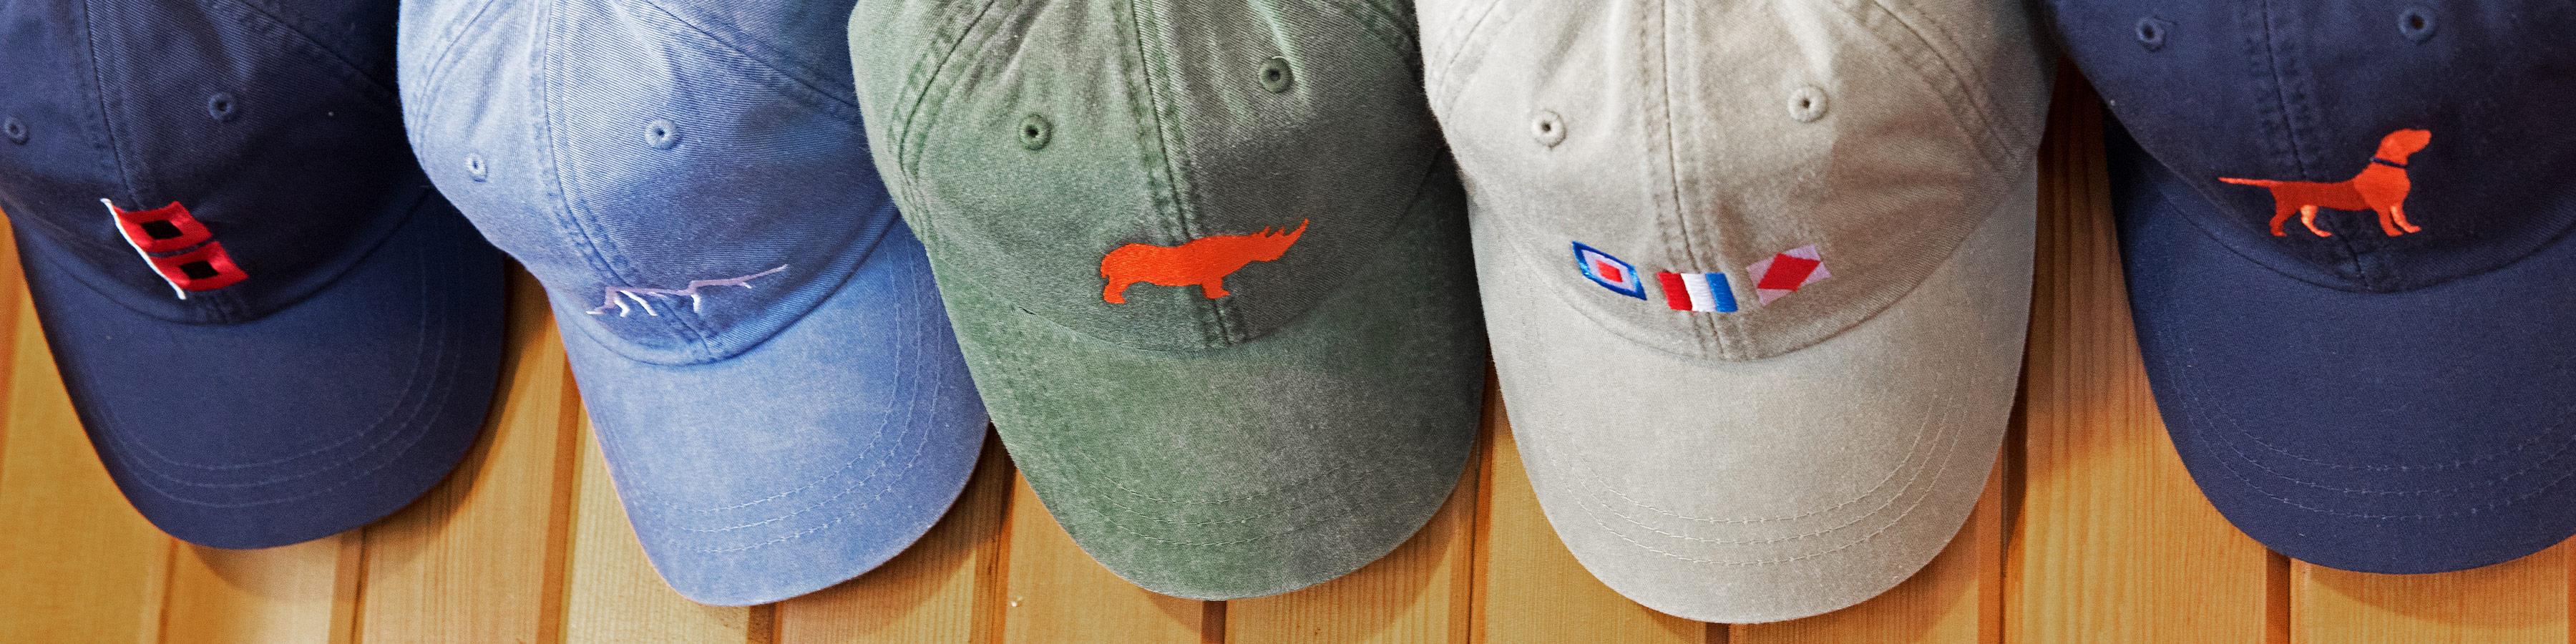 Cotton Hats on Rack - Rhino, Flags,